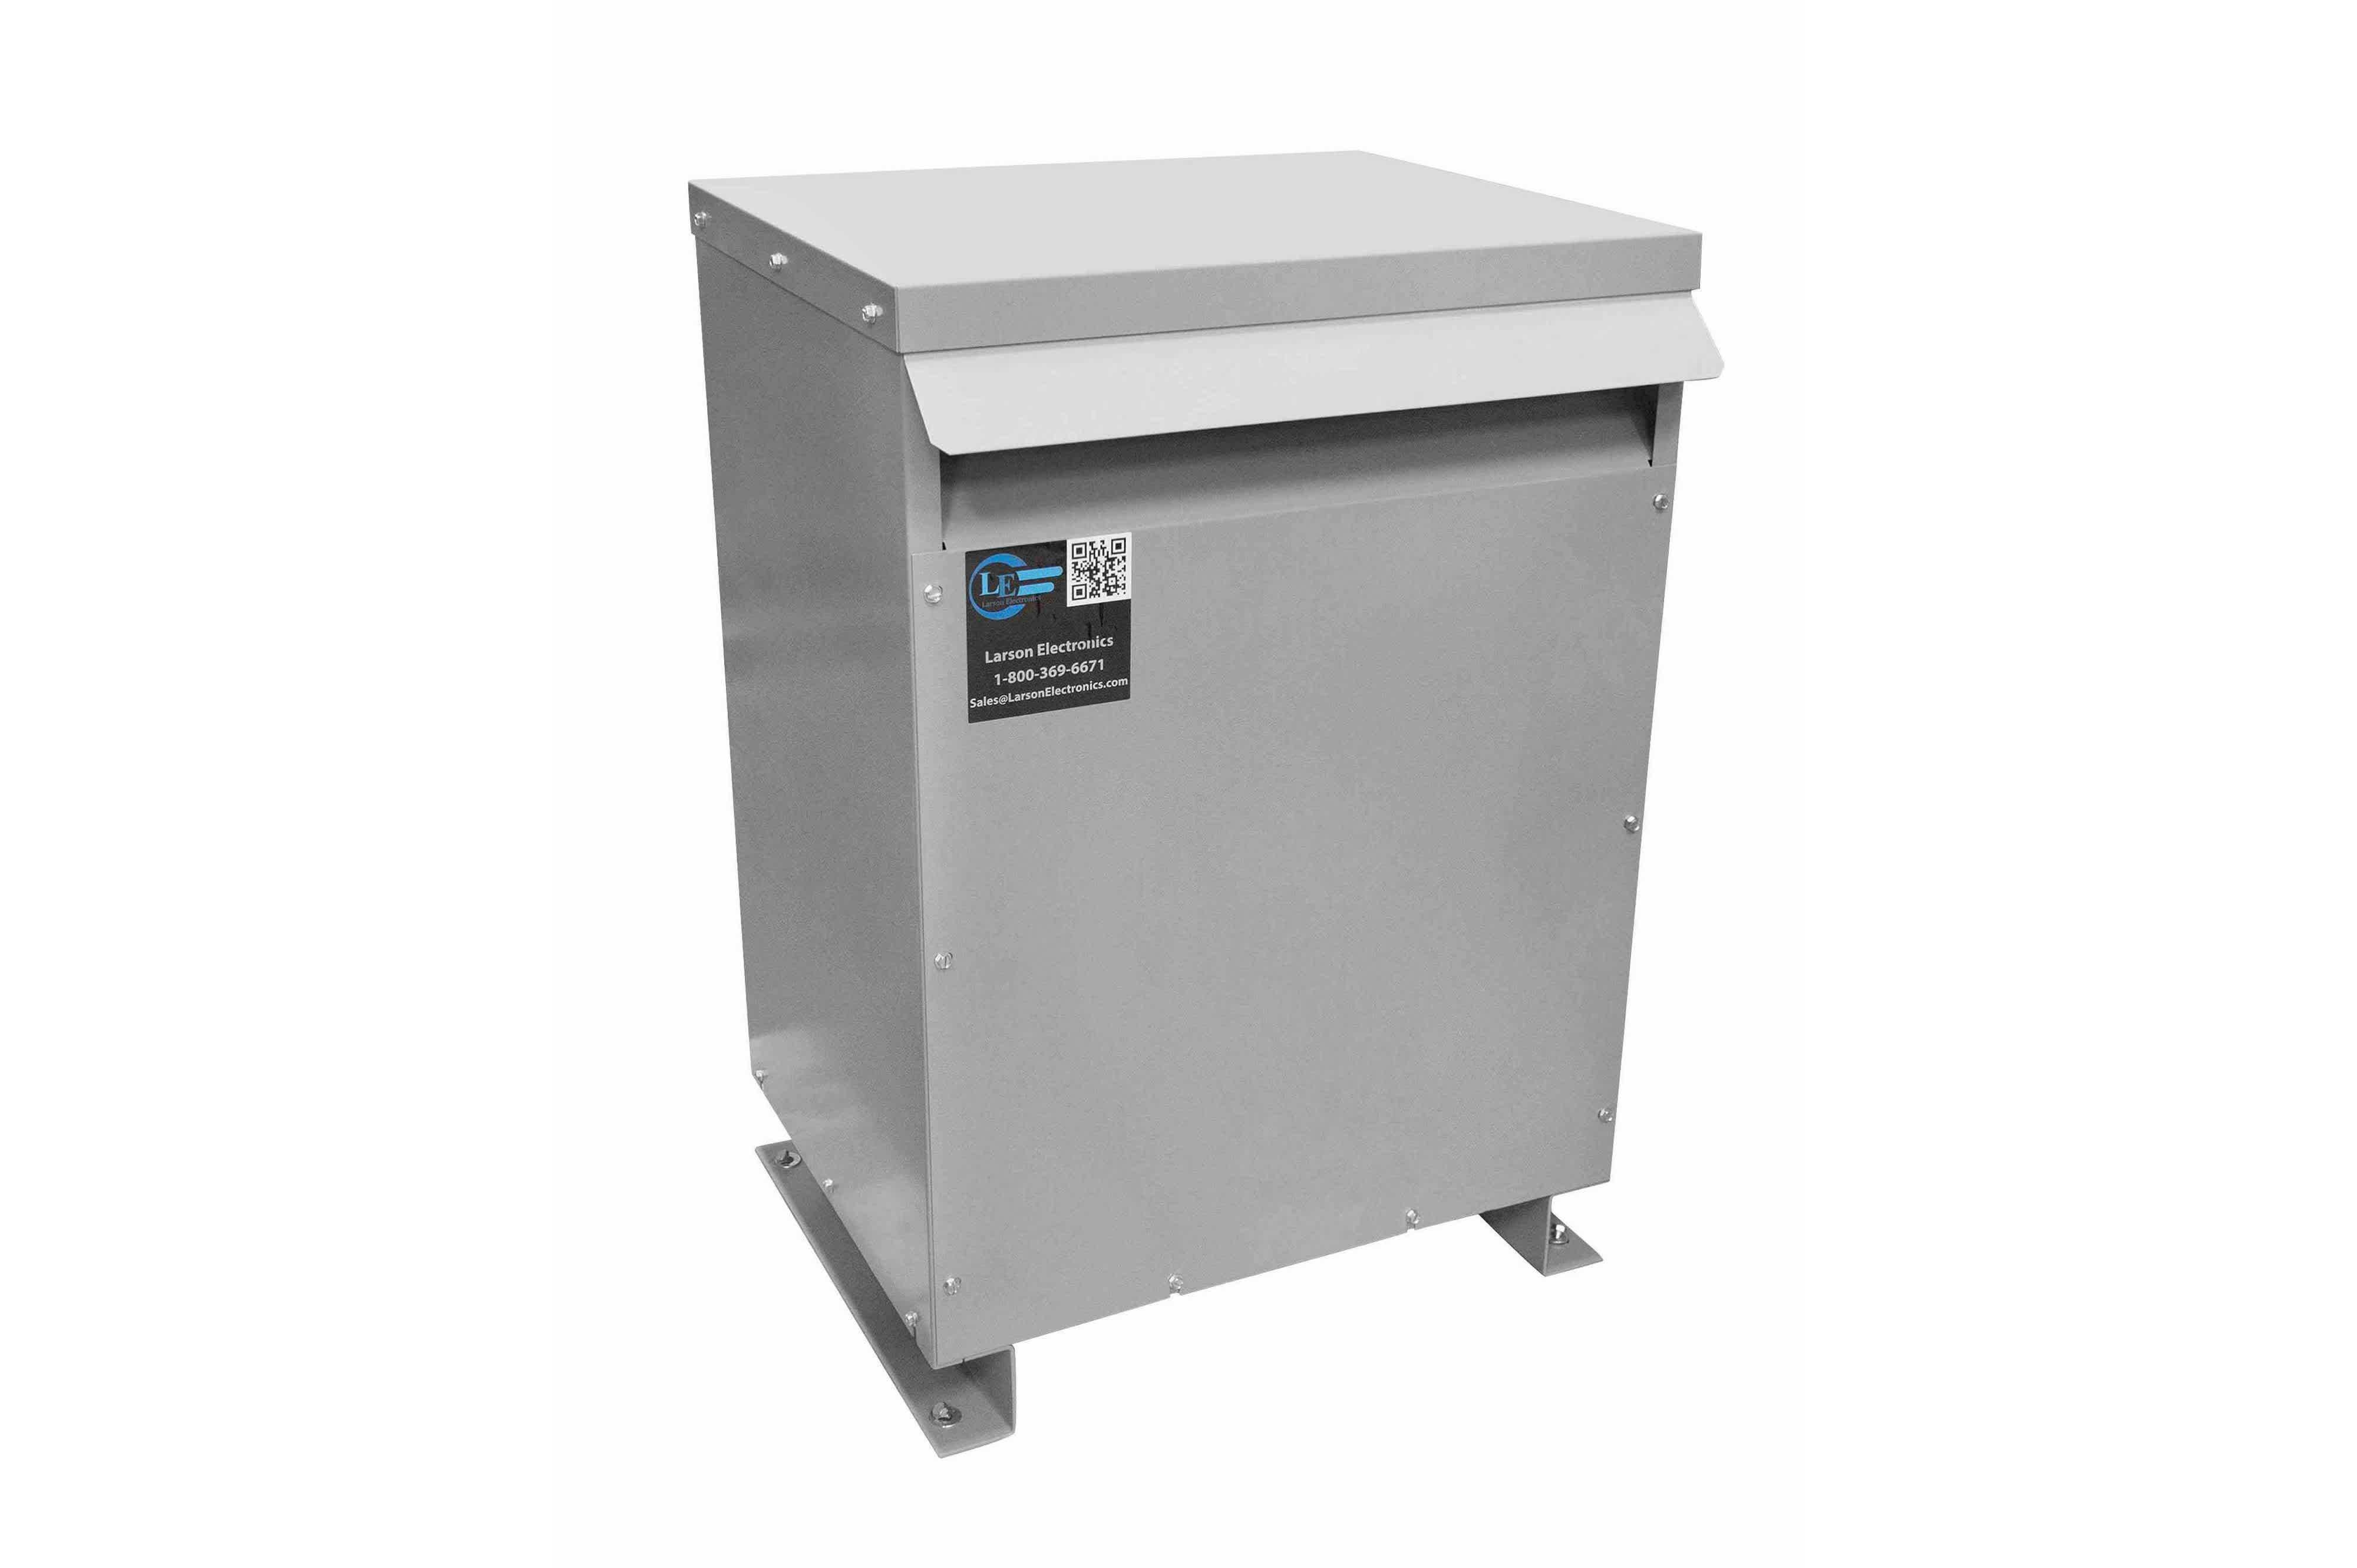 125 kVA 3PH Isolation Transformer, 208V Wye Primary, 380V Delta Secondary, N3R, Ventilated, 60 Hz